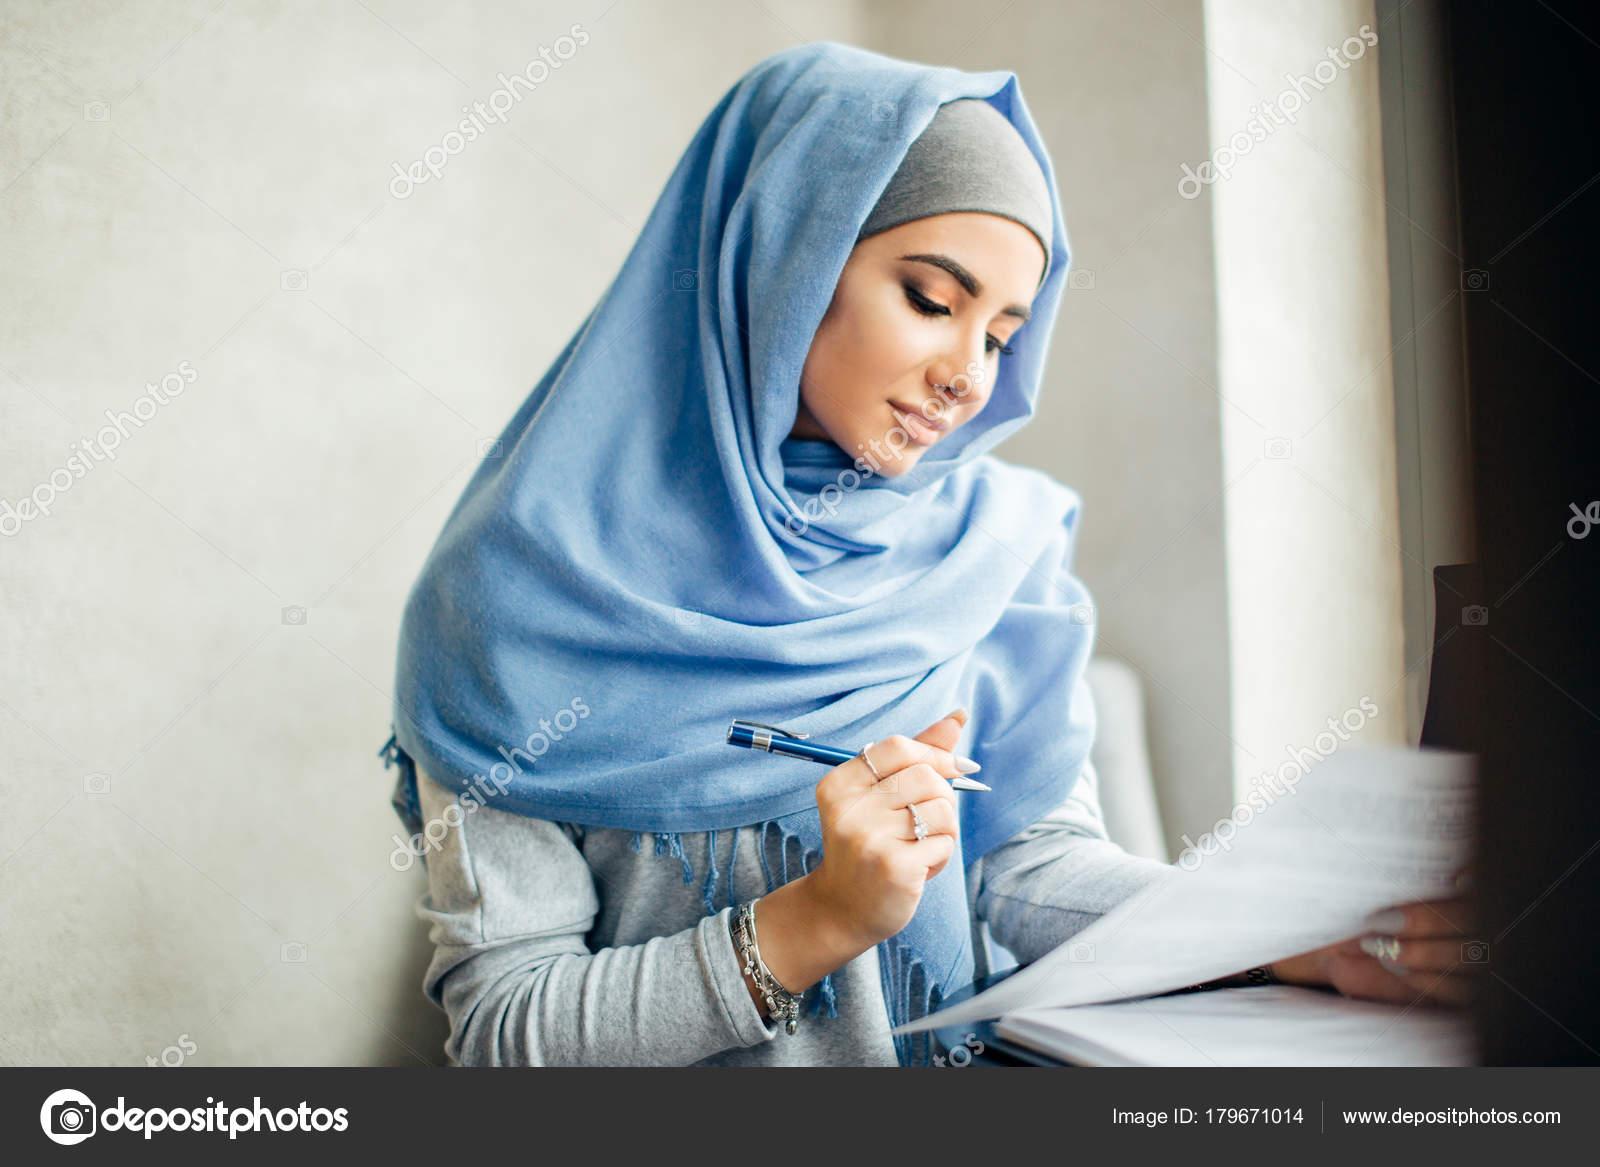 Chat con mujeres musulmanas [PUNIQRANDLINE-(au-dating-names.txt) 27